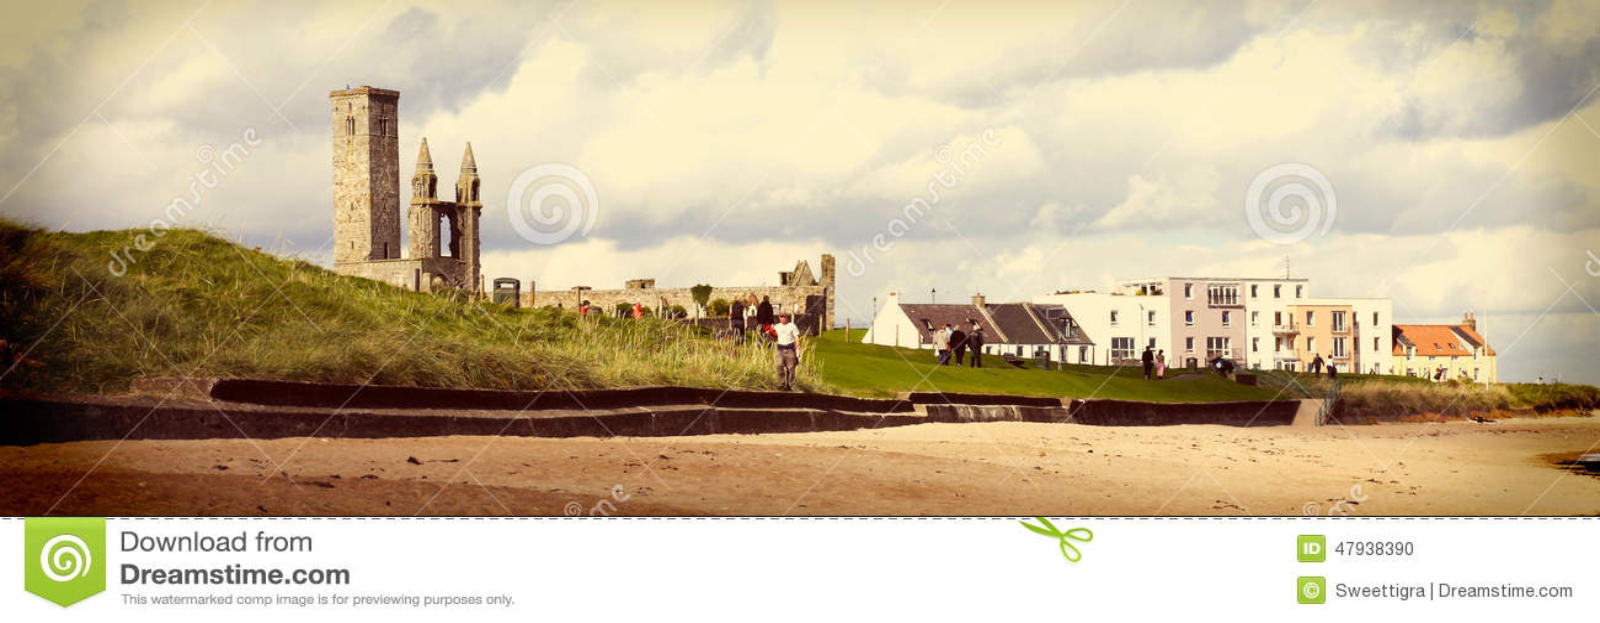 St. Andrews Abbey and University, North Sea coast, Scotland